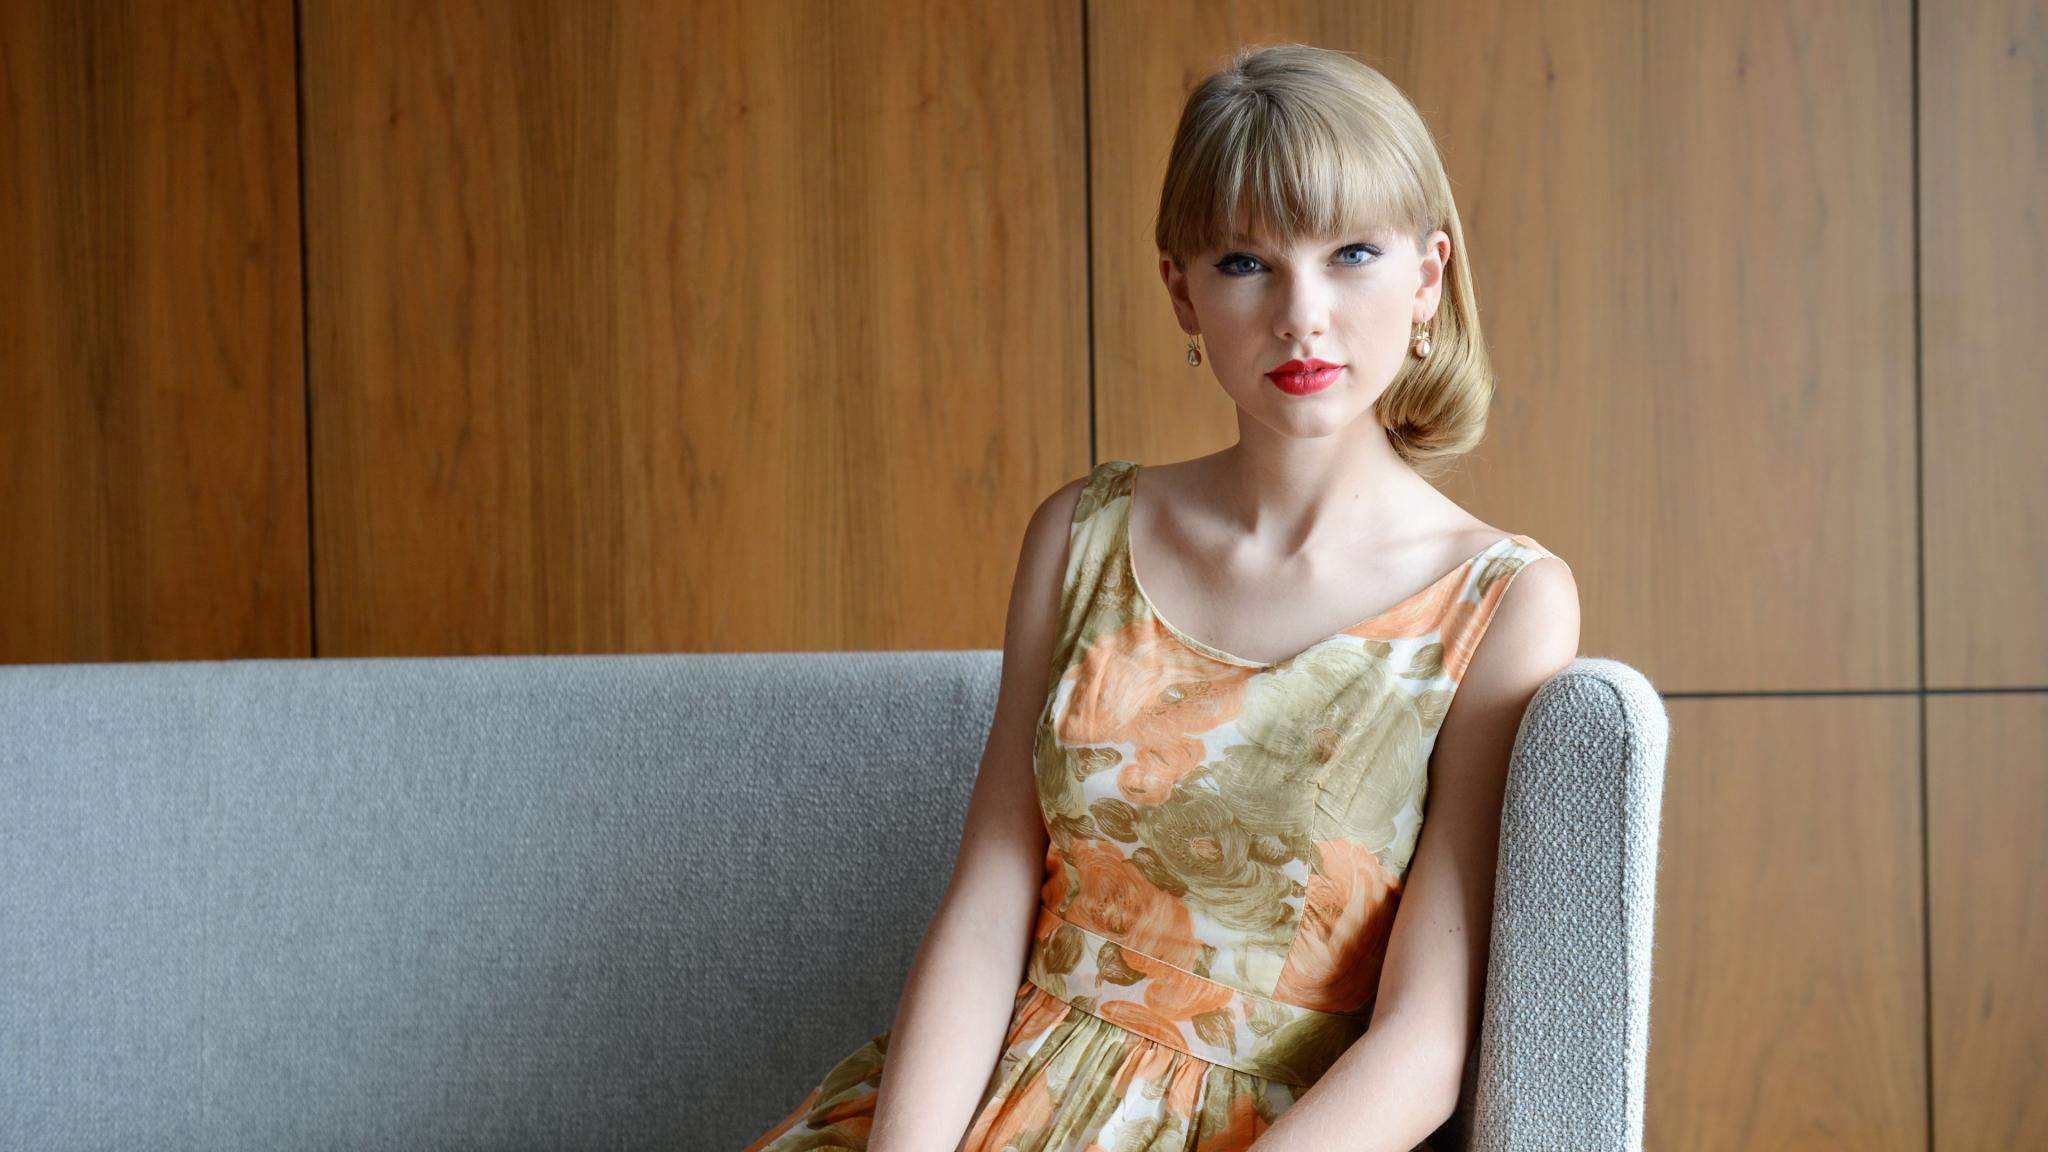 Taylor Swift For Aap Photoshoot Hd 4k Wallpaper